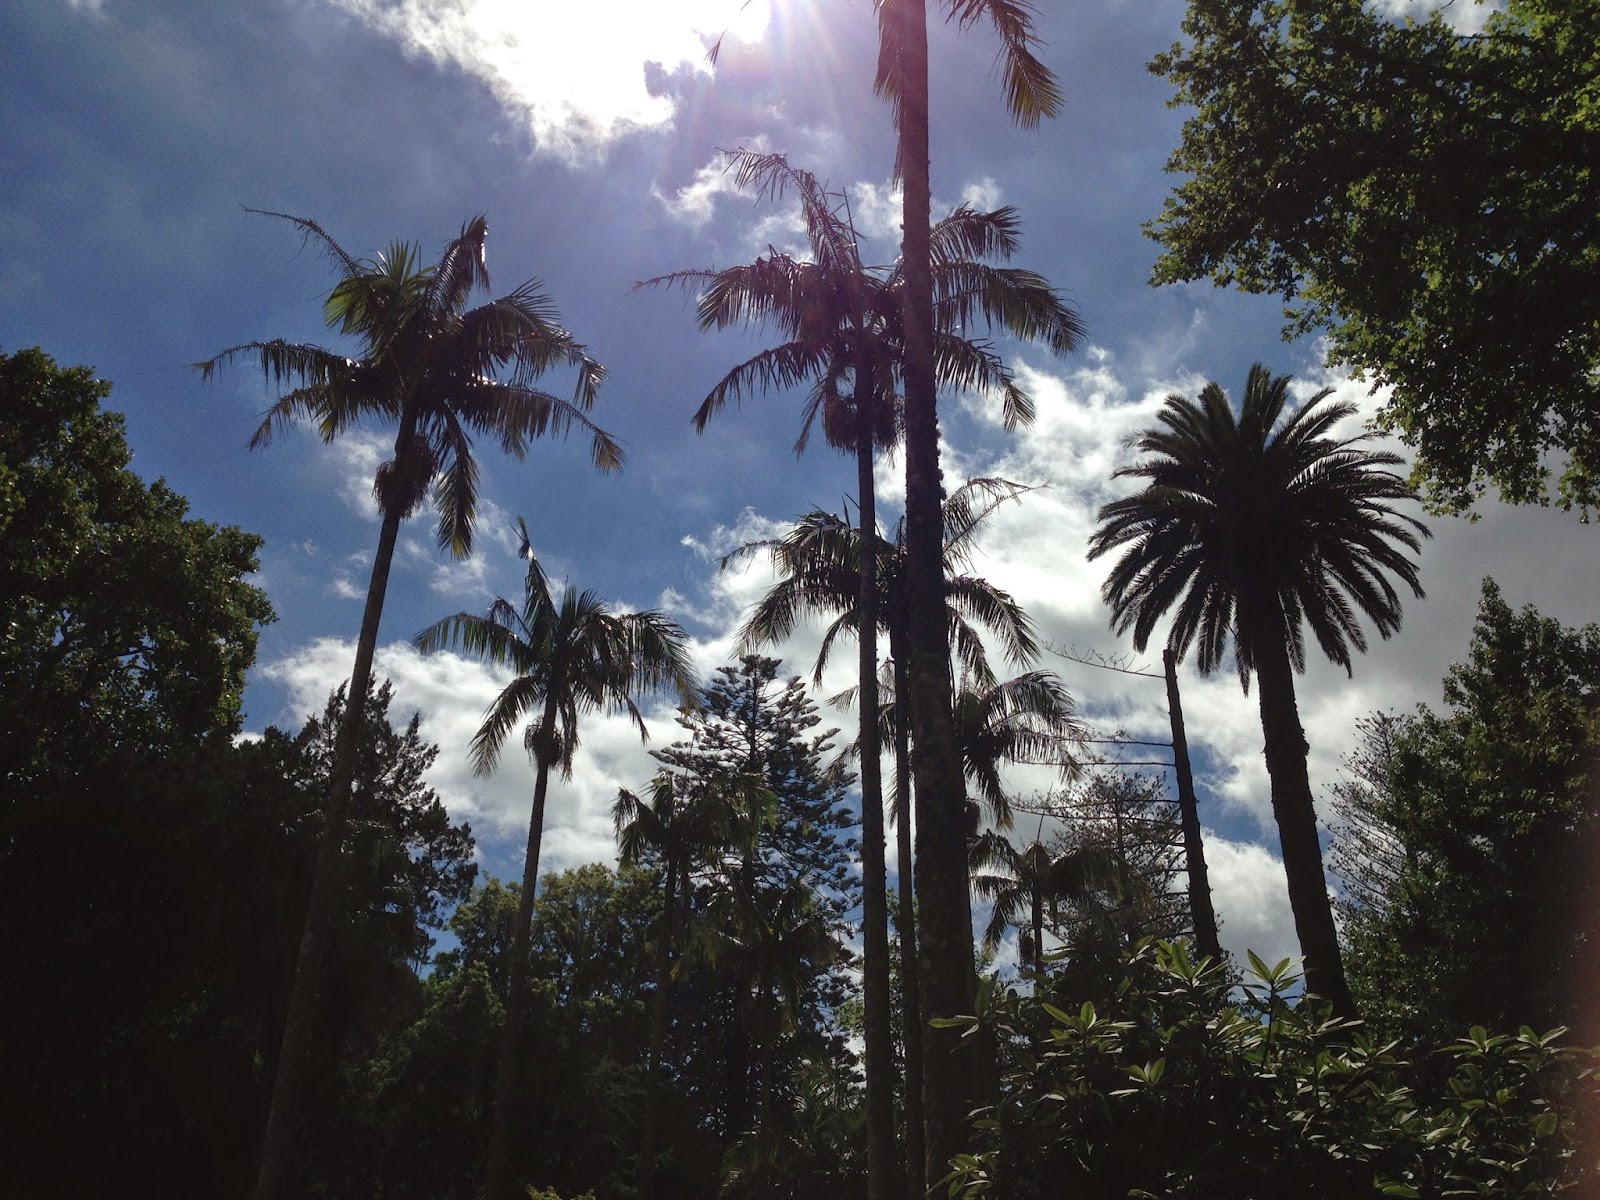 Palms at Terra Nosta Gardens